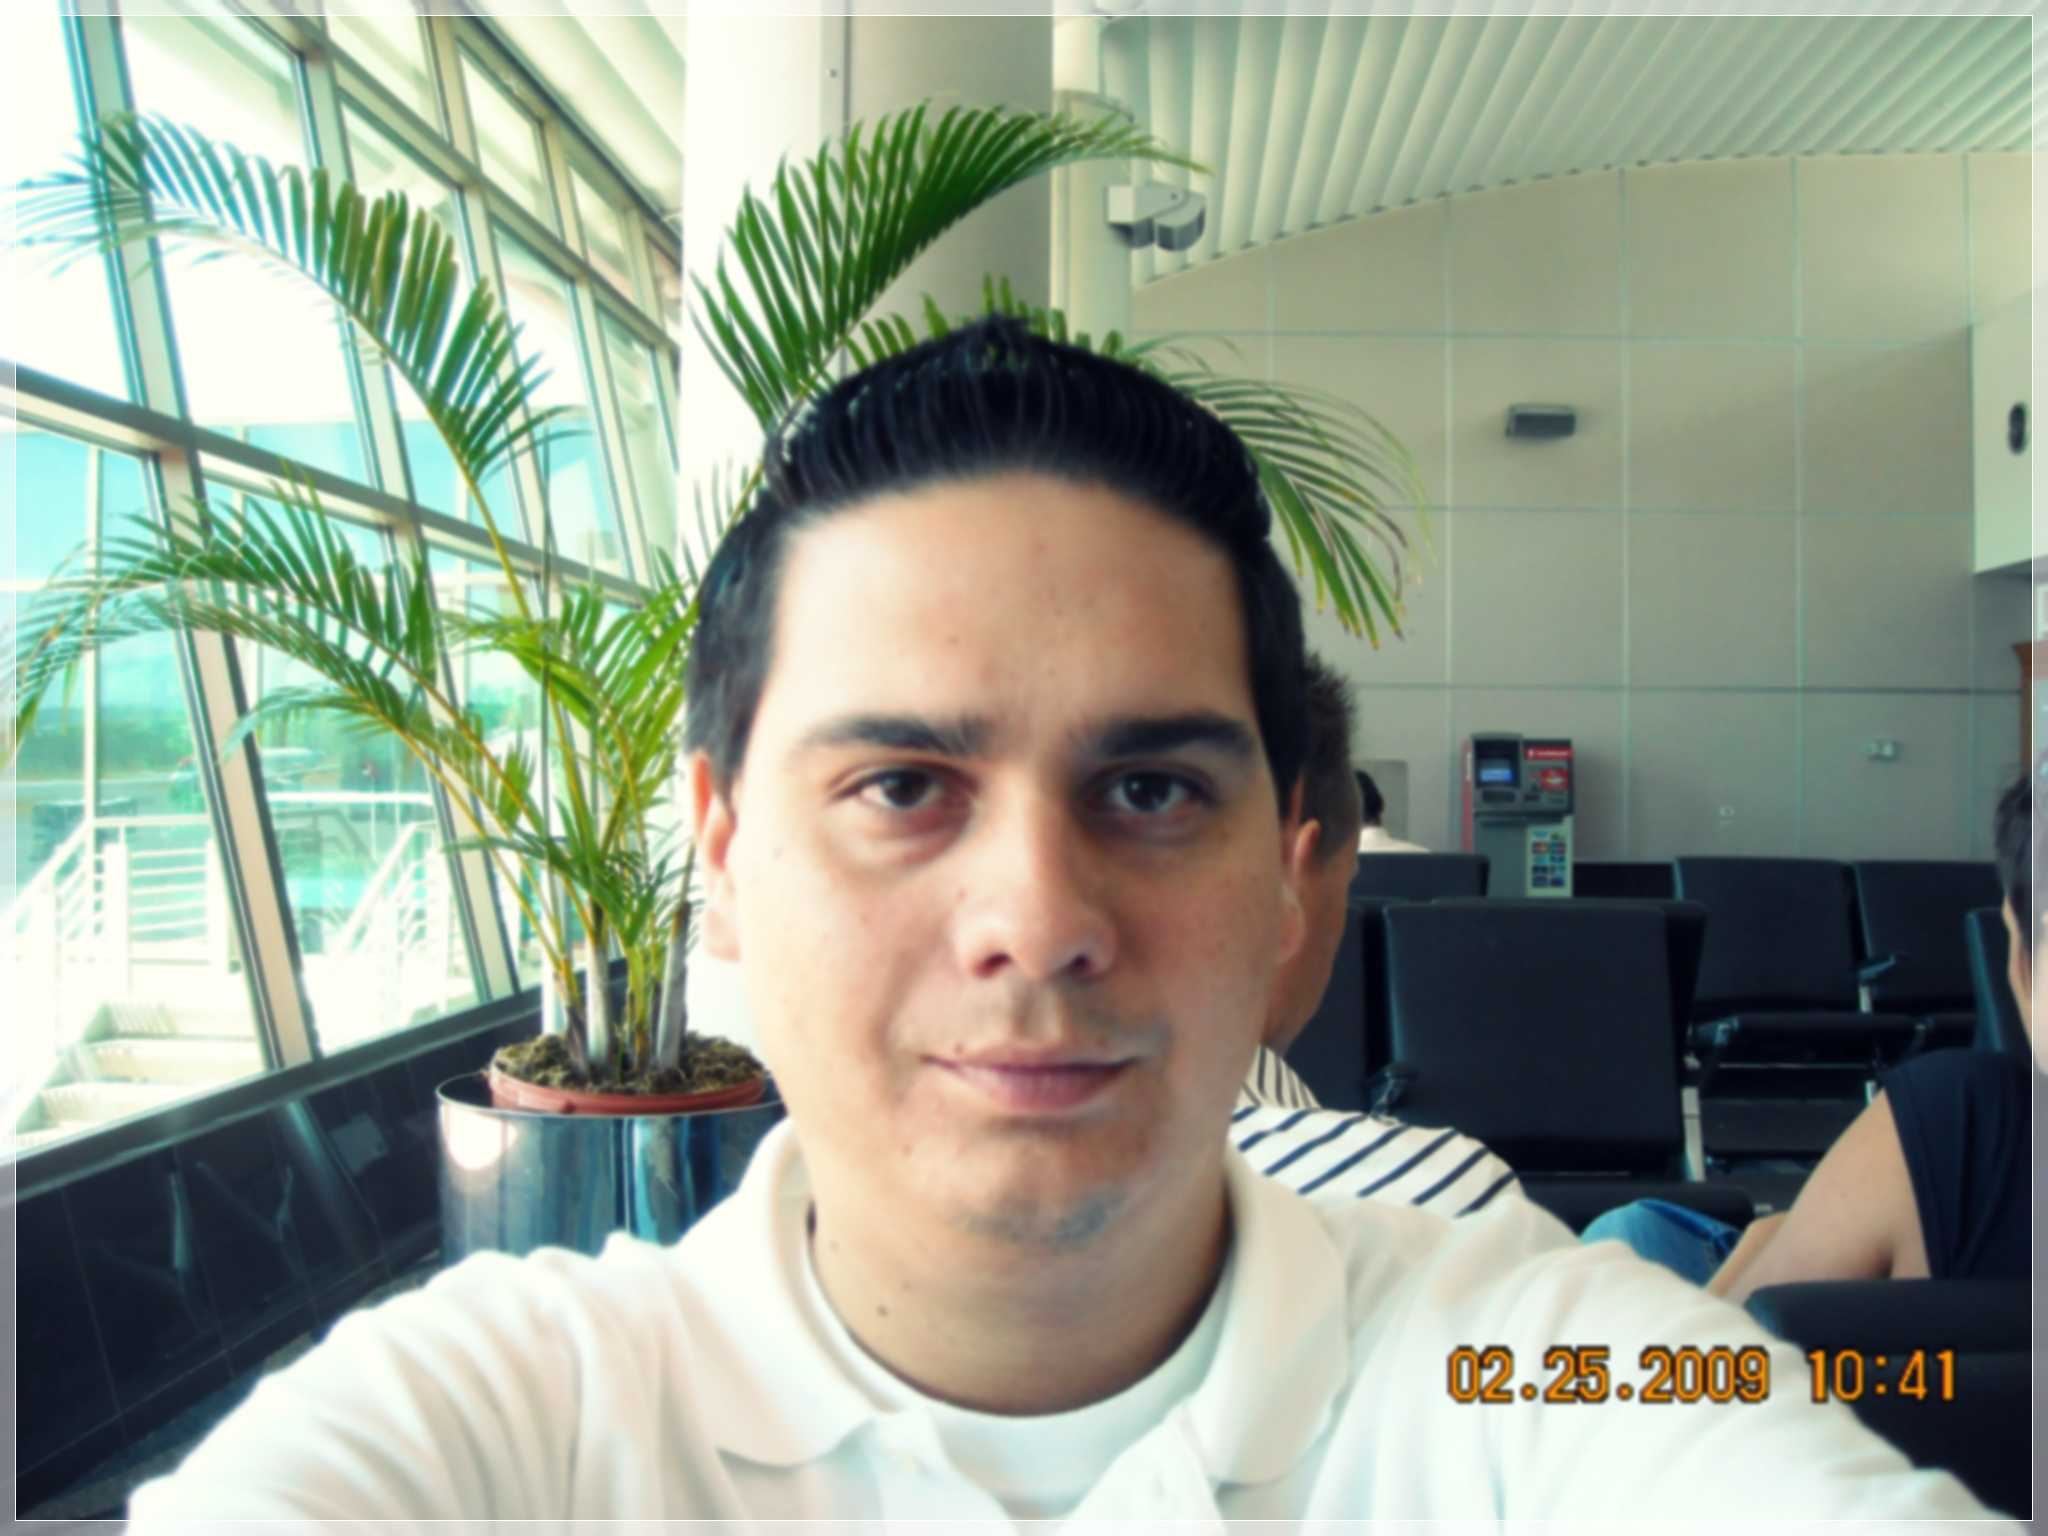 Alejandro Arias Vargas